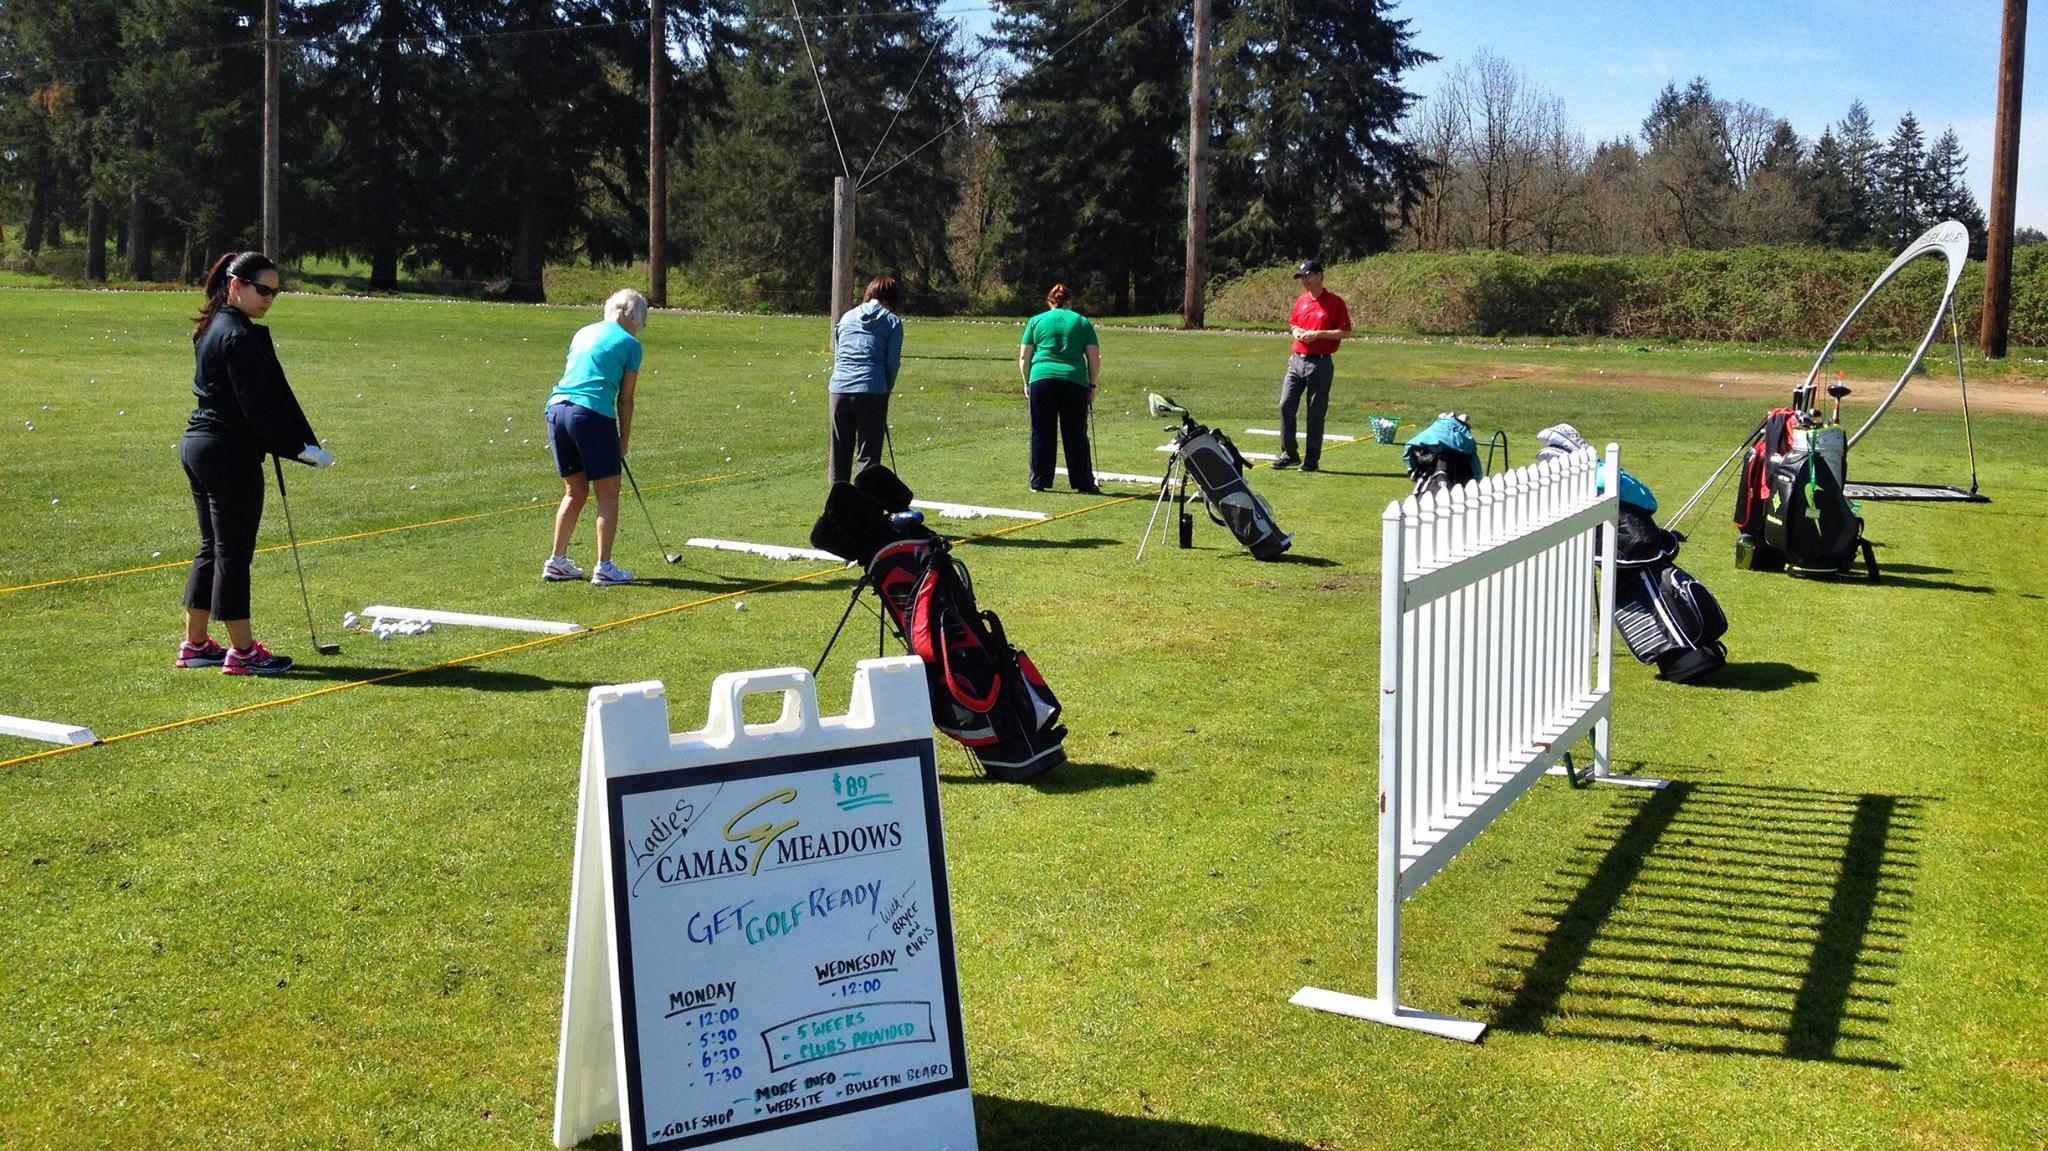 Chris Garrison Golf Instruction Camas Meadows